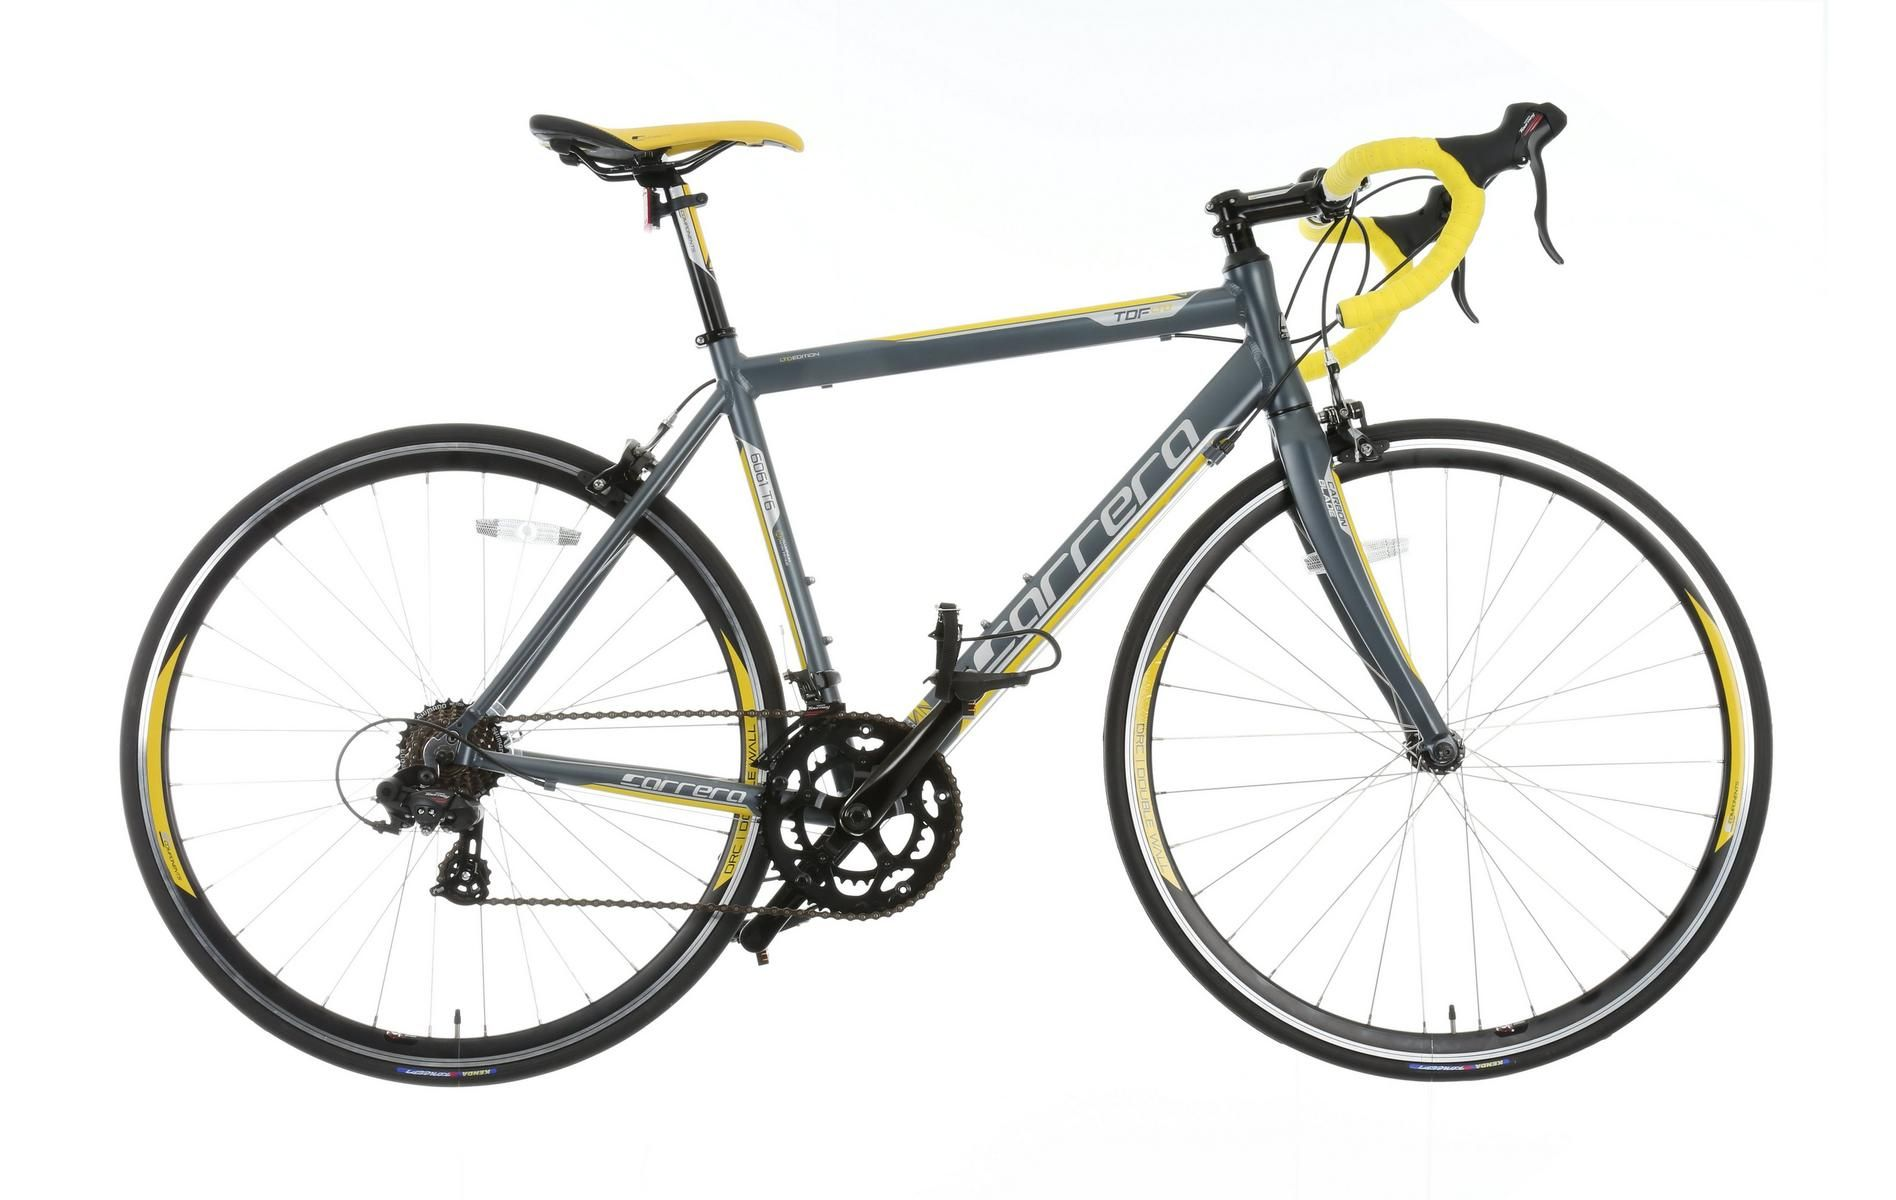 Carrera Tdf Mens Ltd Road Bike Road Racing Bike Racing Bikes Folding Mountain Bike